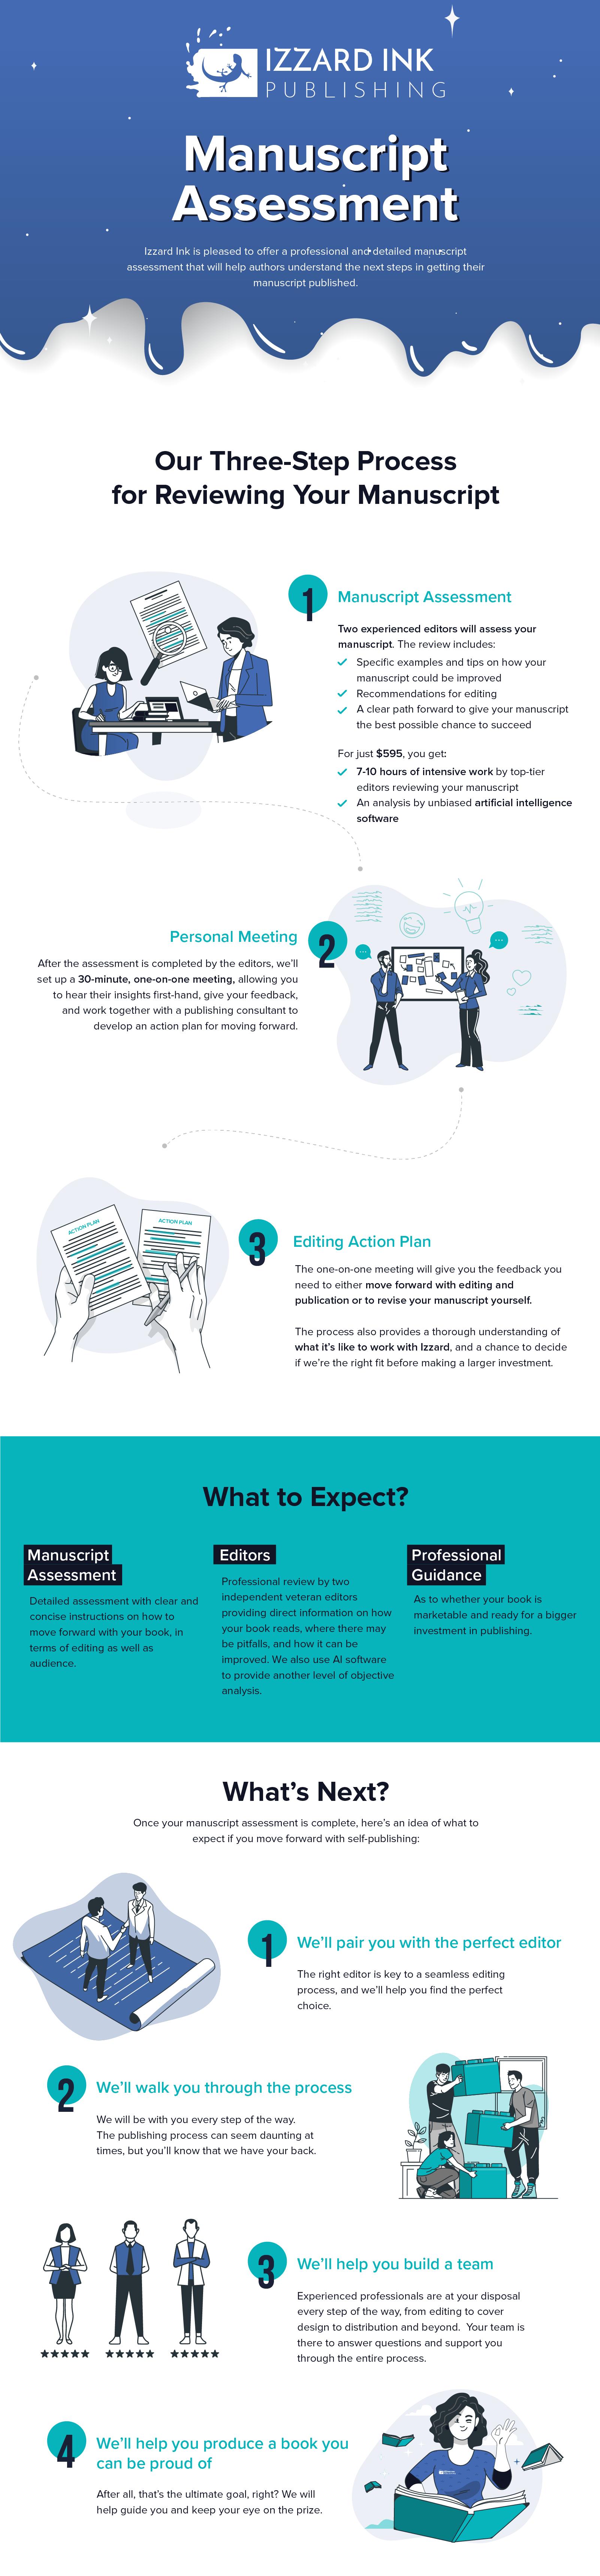 Manuscript Assessment Infographic